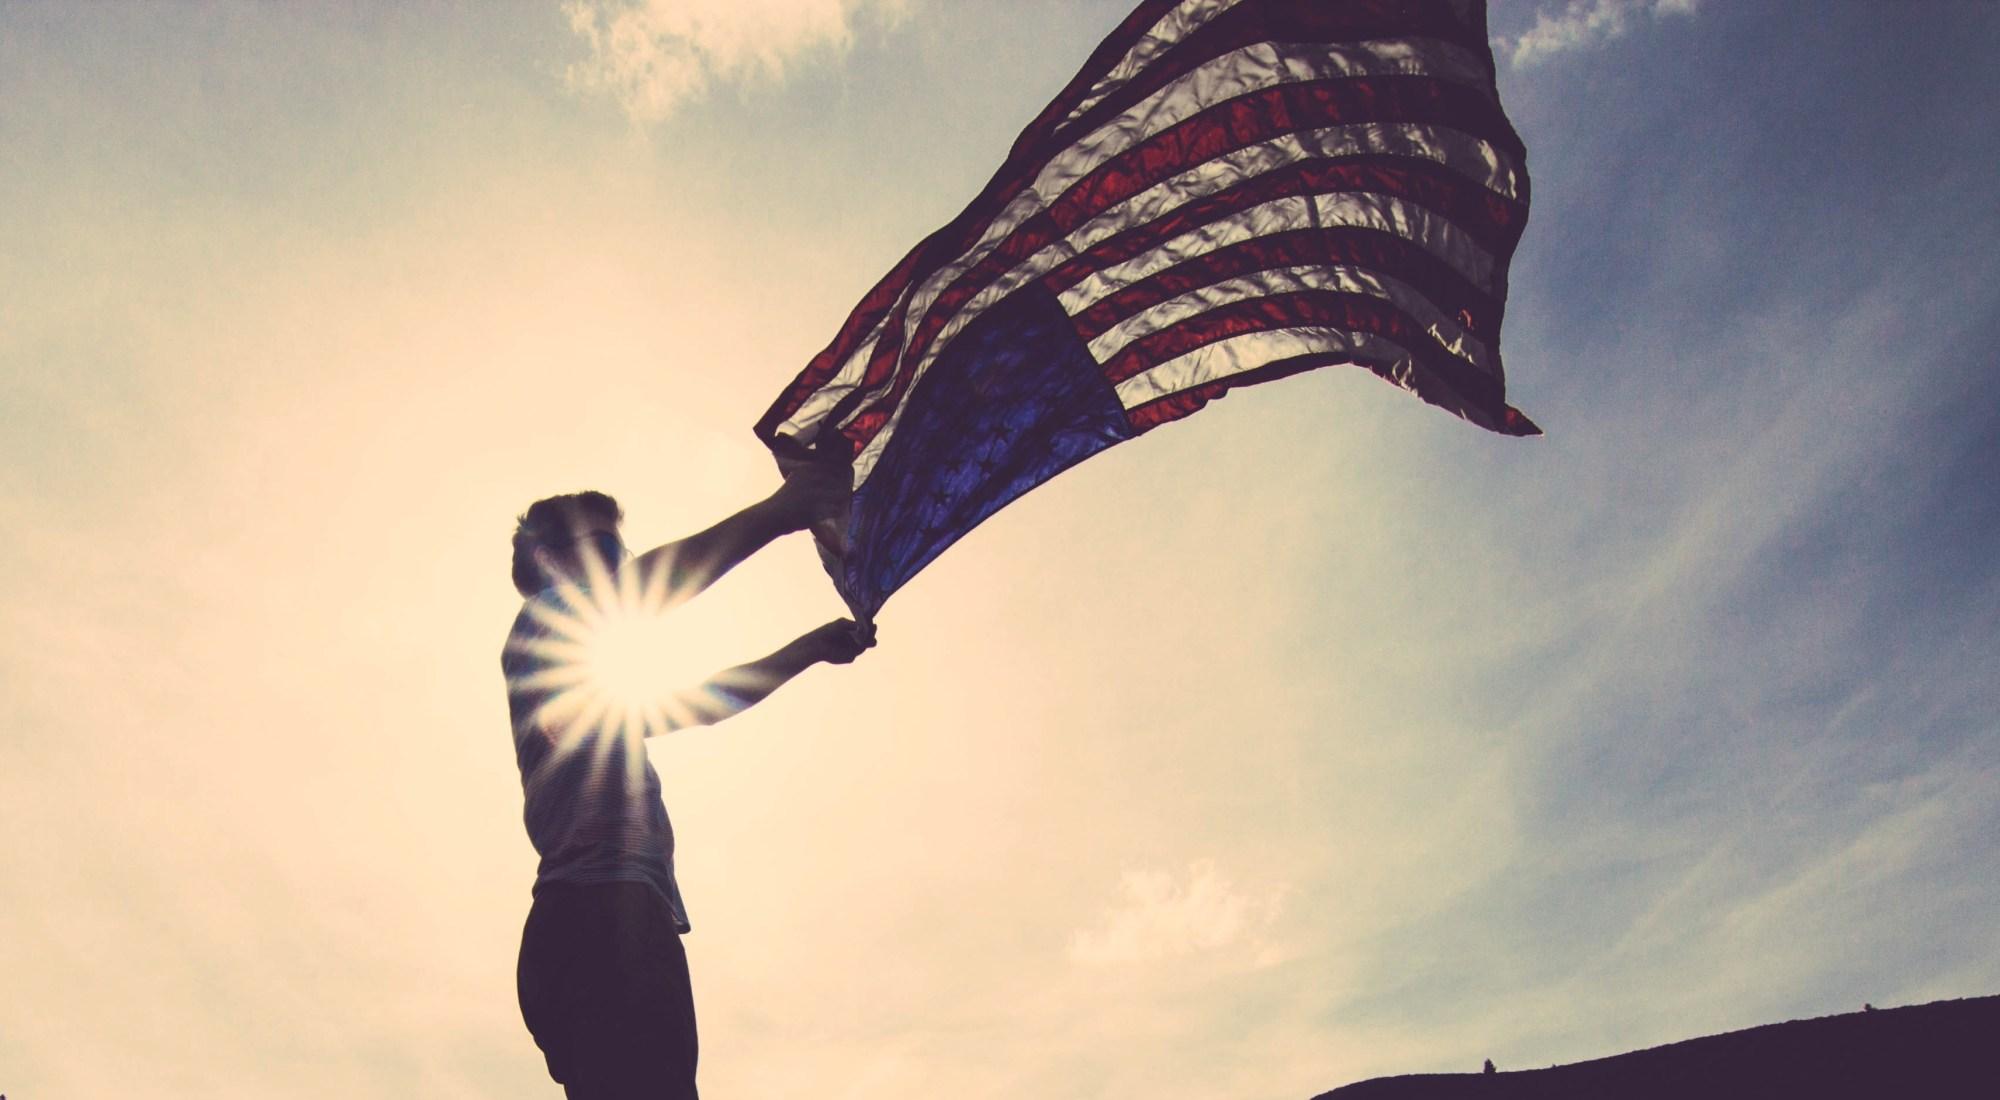 american flag, distress signal, Dear America open letter, never Trump, broken hearted, politics